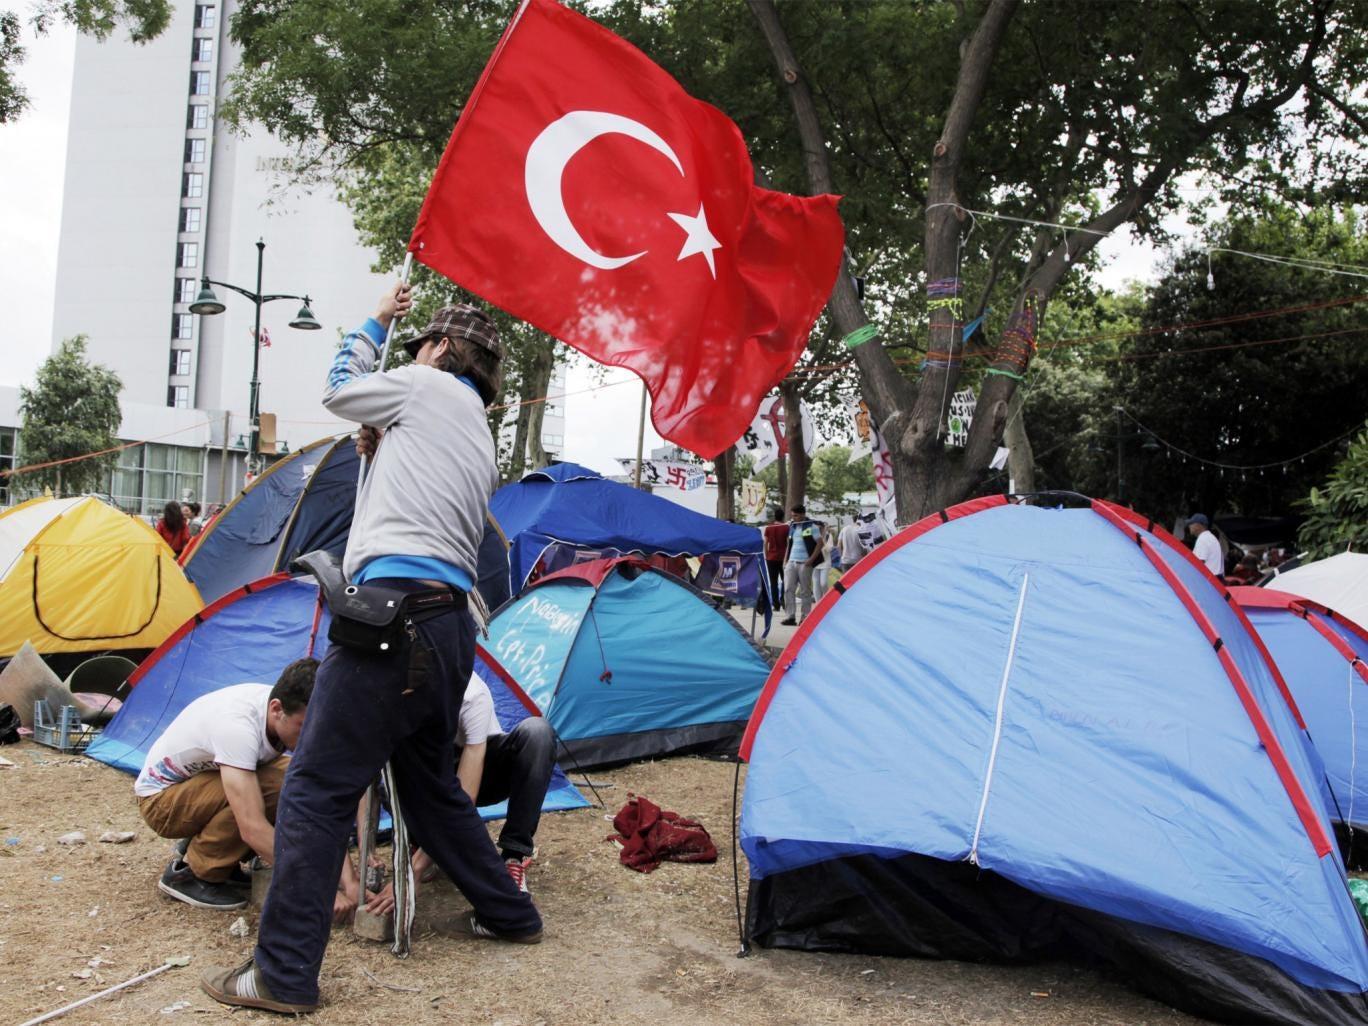 Demonstrators set up camp at Taksim Gezi park, Istanbul